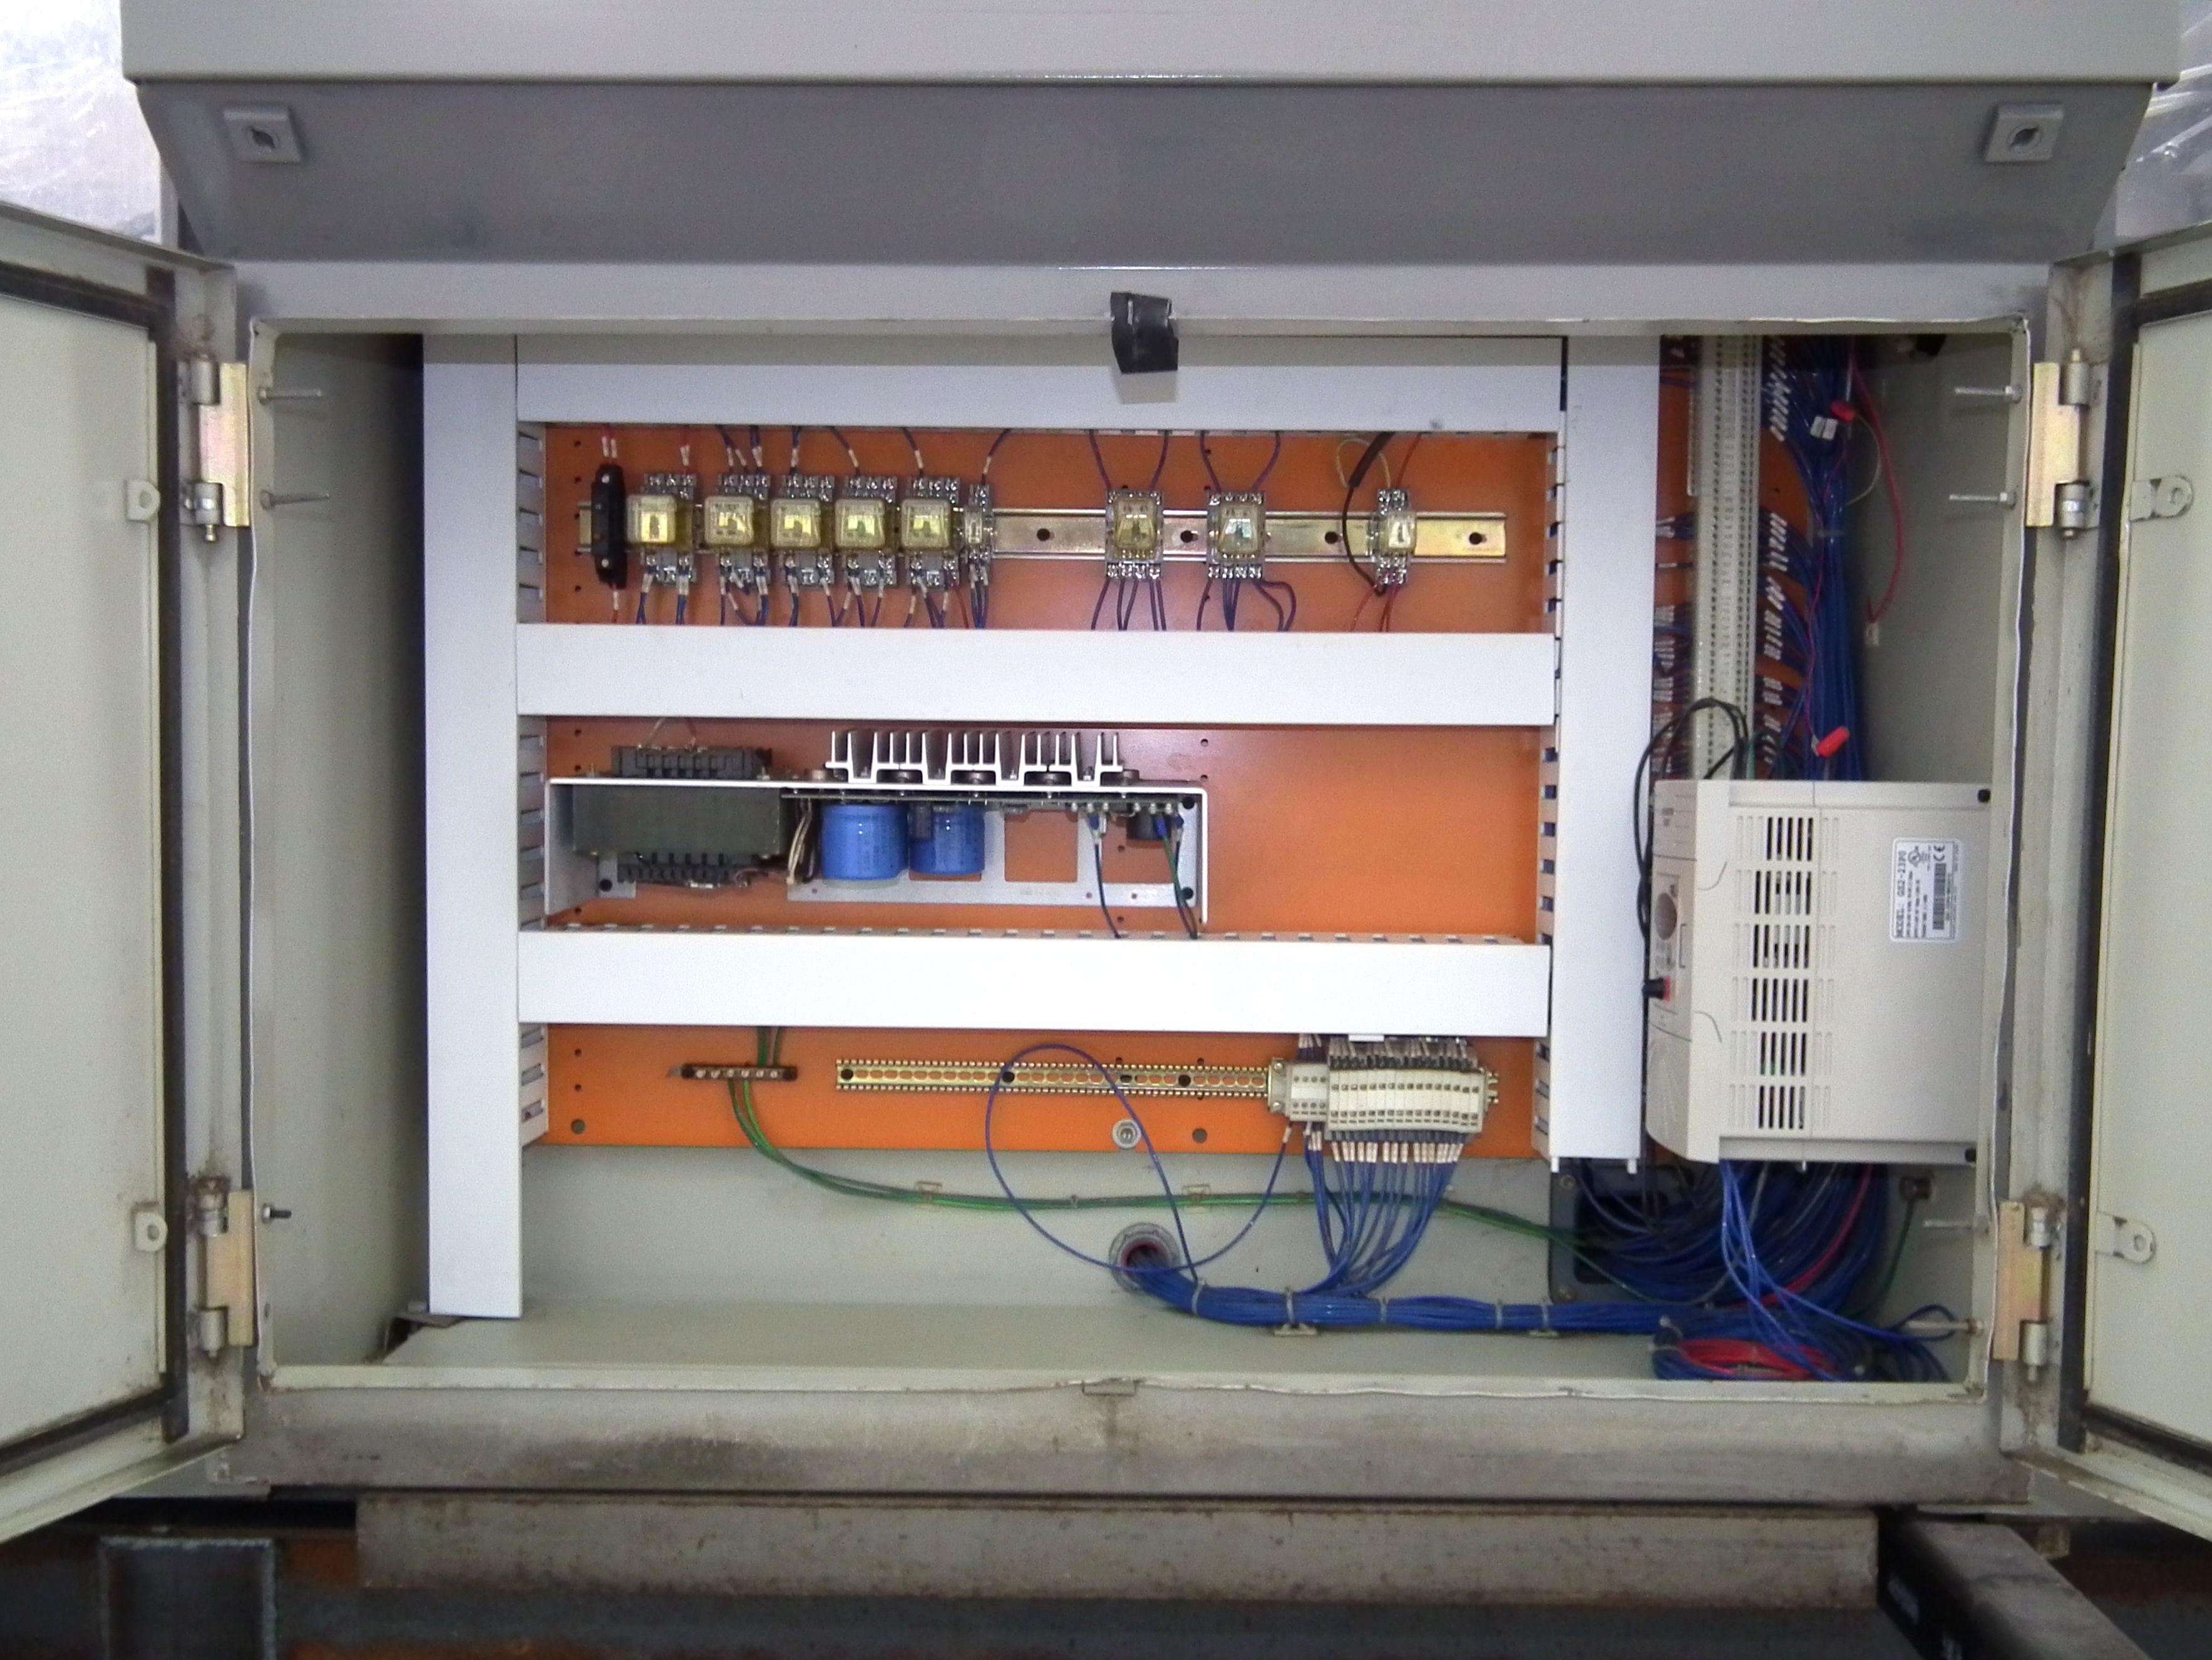 Dimension 800 Overhead Confinement Glue Cartoner B4111 - Image 14 of 17